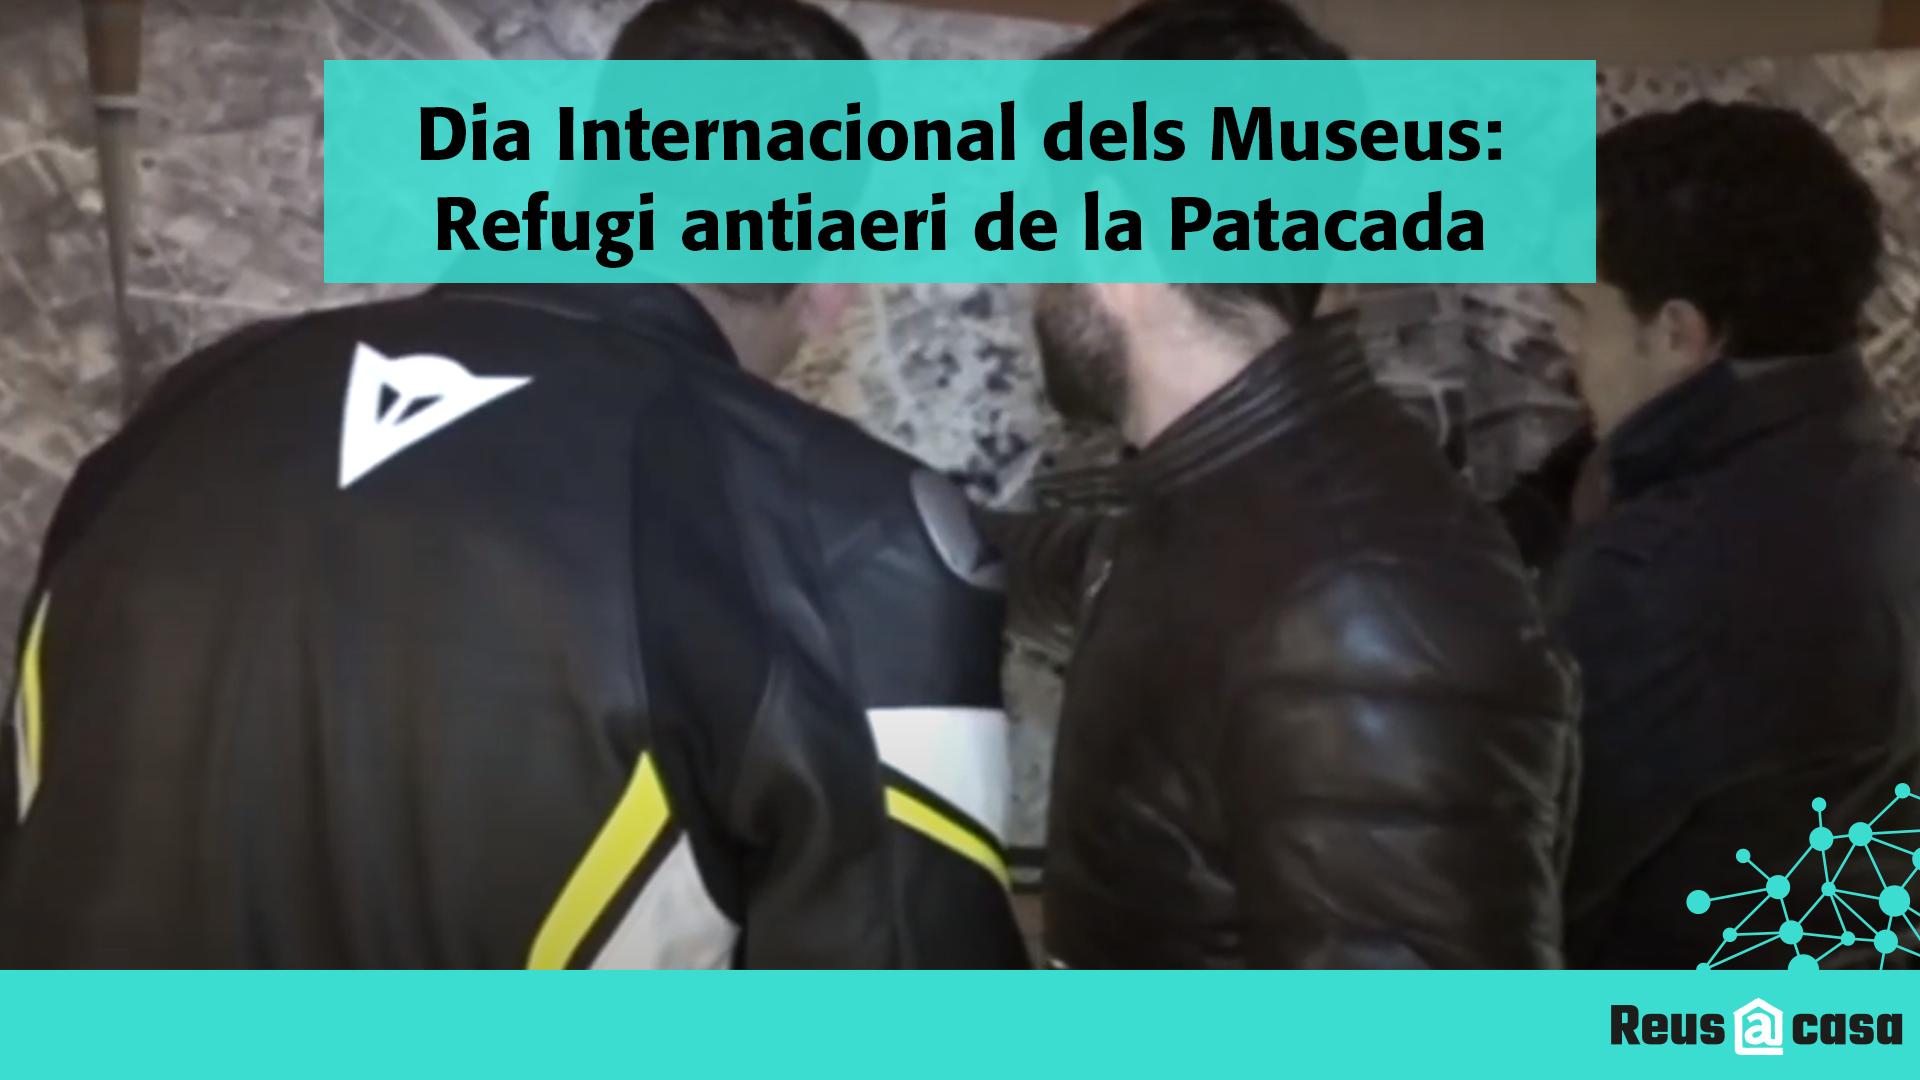 Dia Internacional dels Museus: Refugi antiaeri de la Patacada